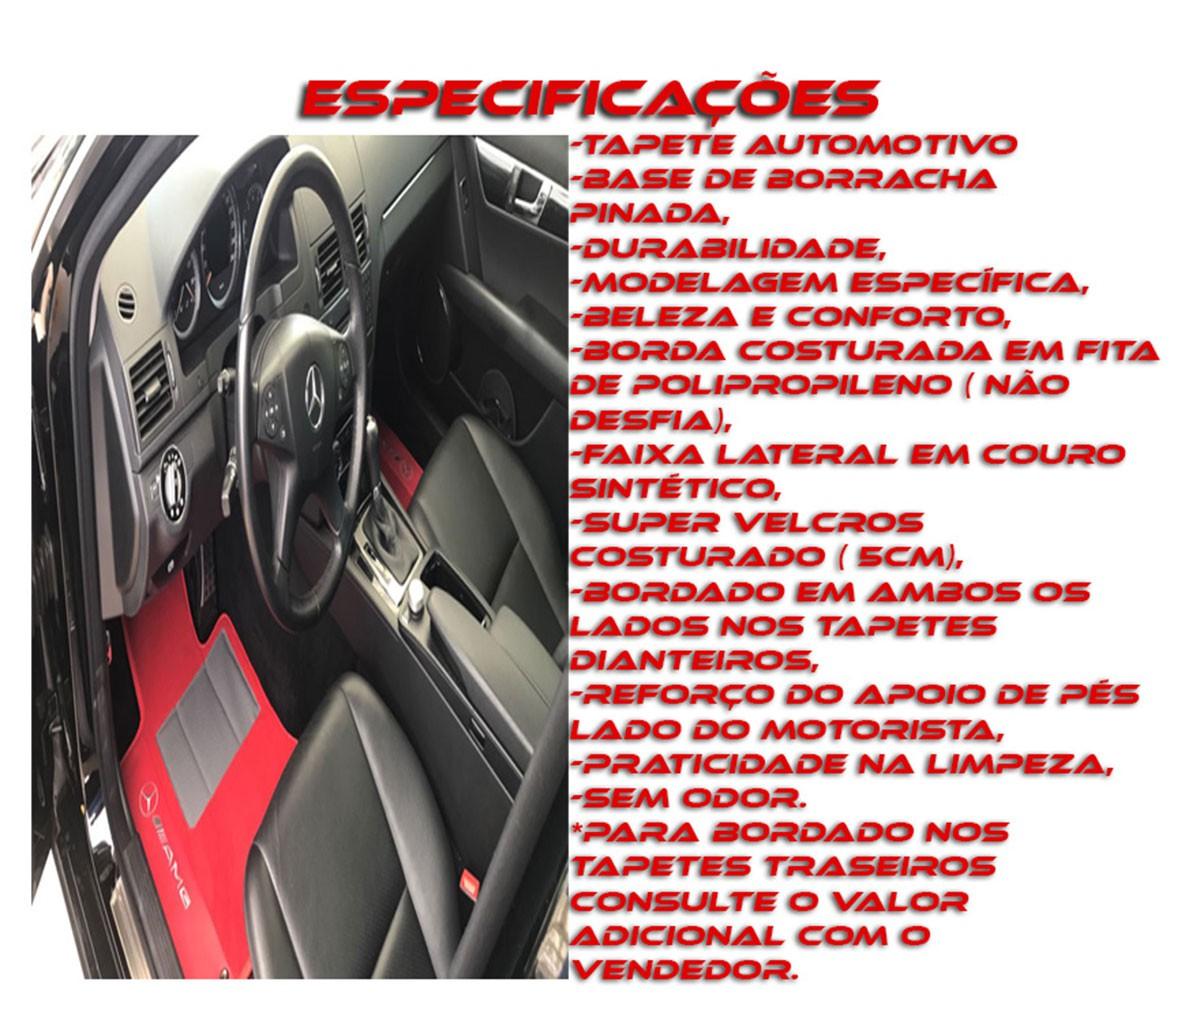 Tapete Bmw X1 Nova Carpete Premium Base Pinada